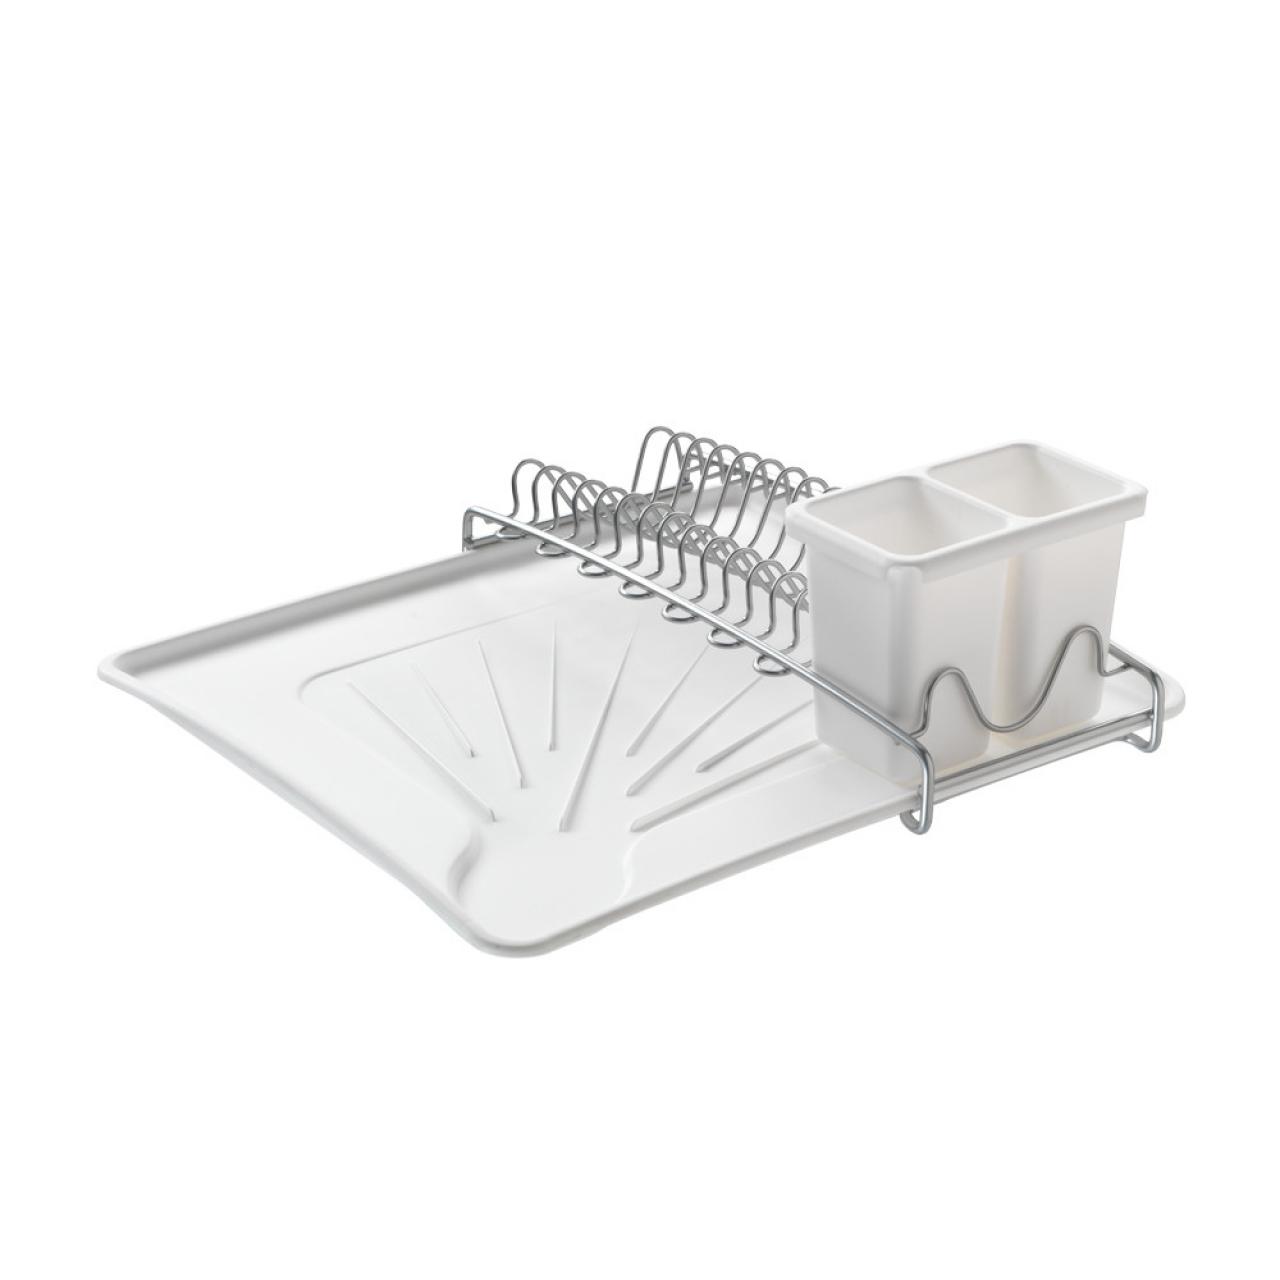 Scurgator vase cu suport pentru tacamuri Space Tex, Metaltex, 12 x 31 x 35 cm, inox/plastic, alb/argintiu